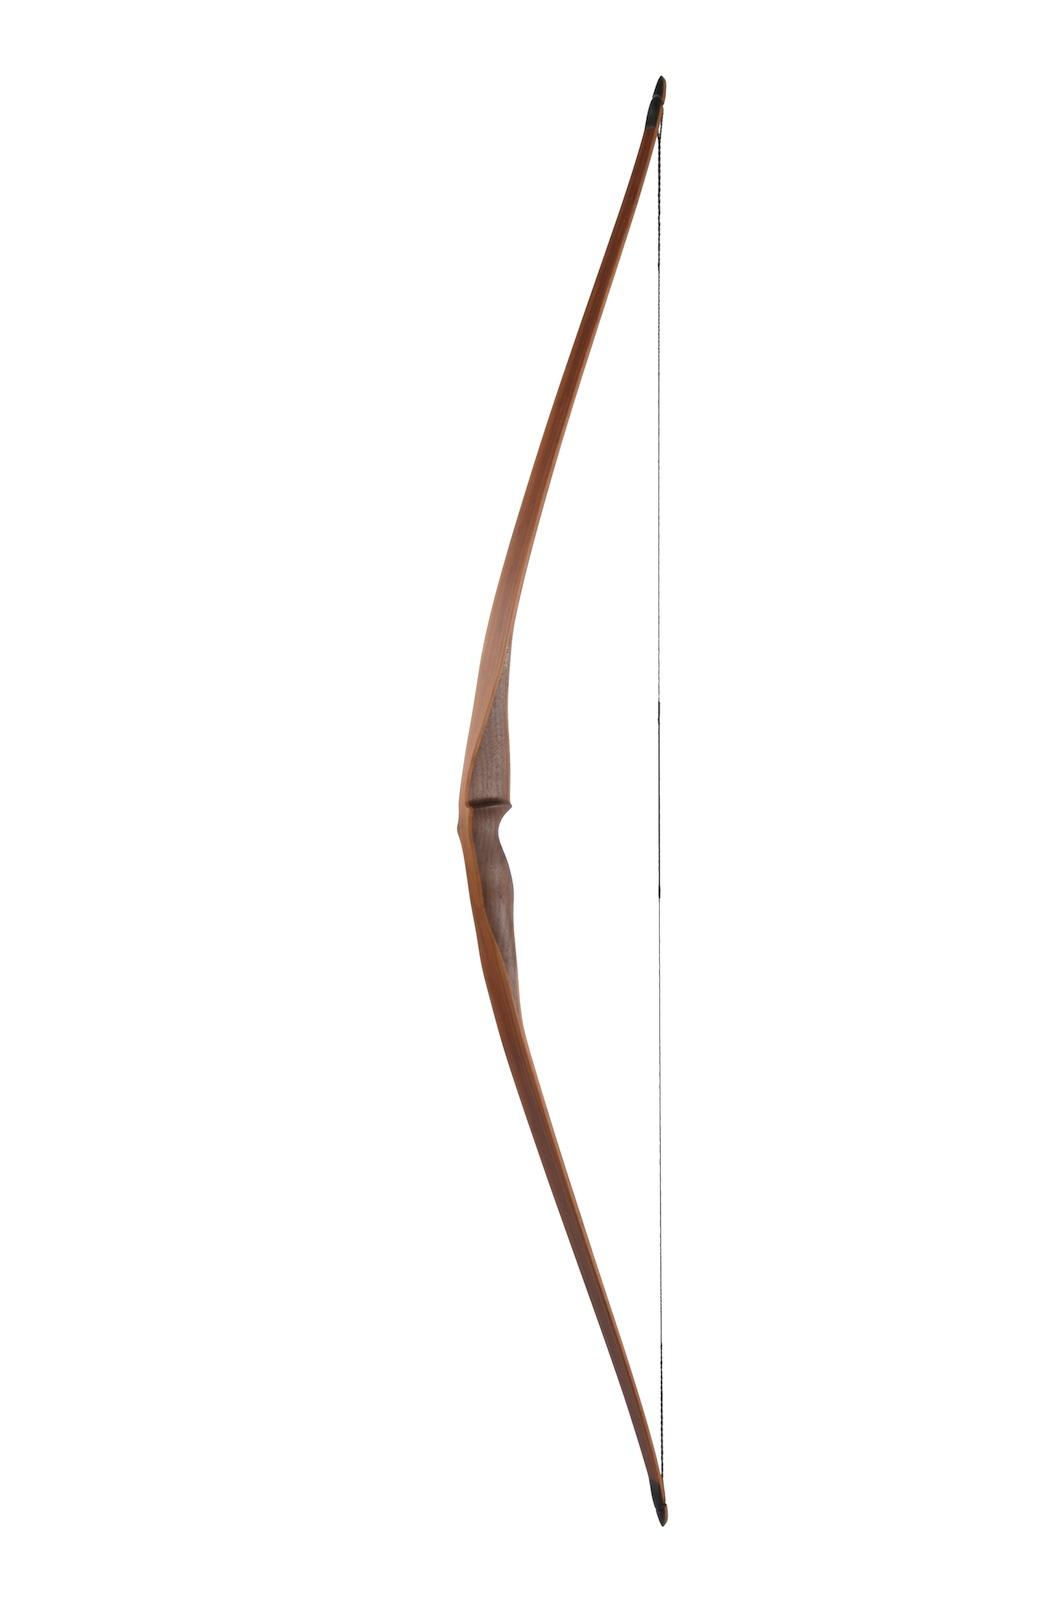 Bodnik Slick Stick flat bow.